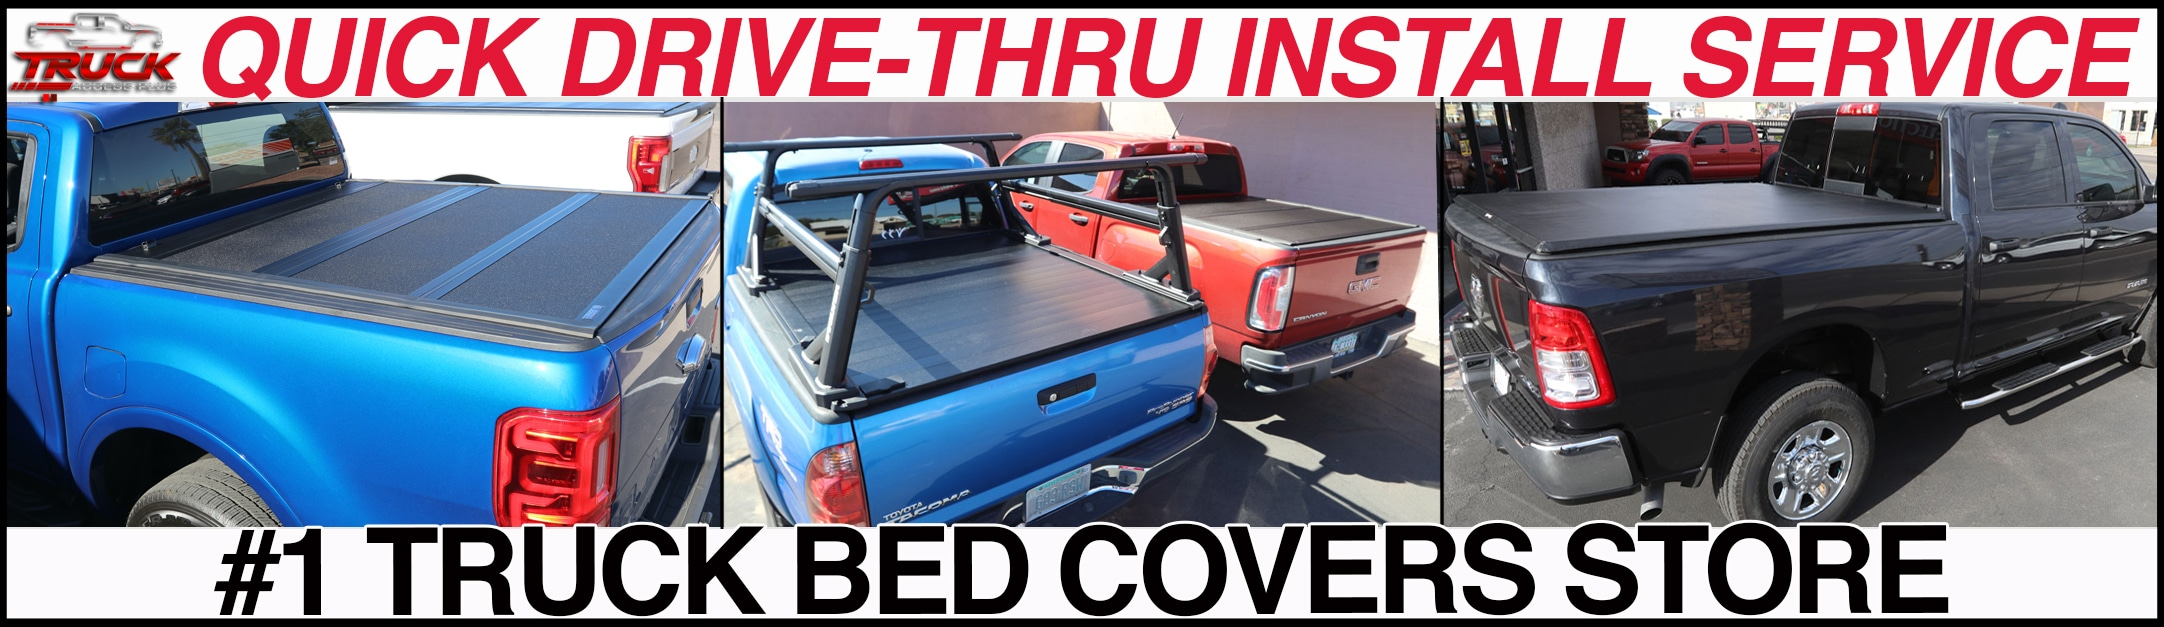 truck bed covers in phoenix az